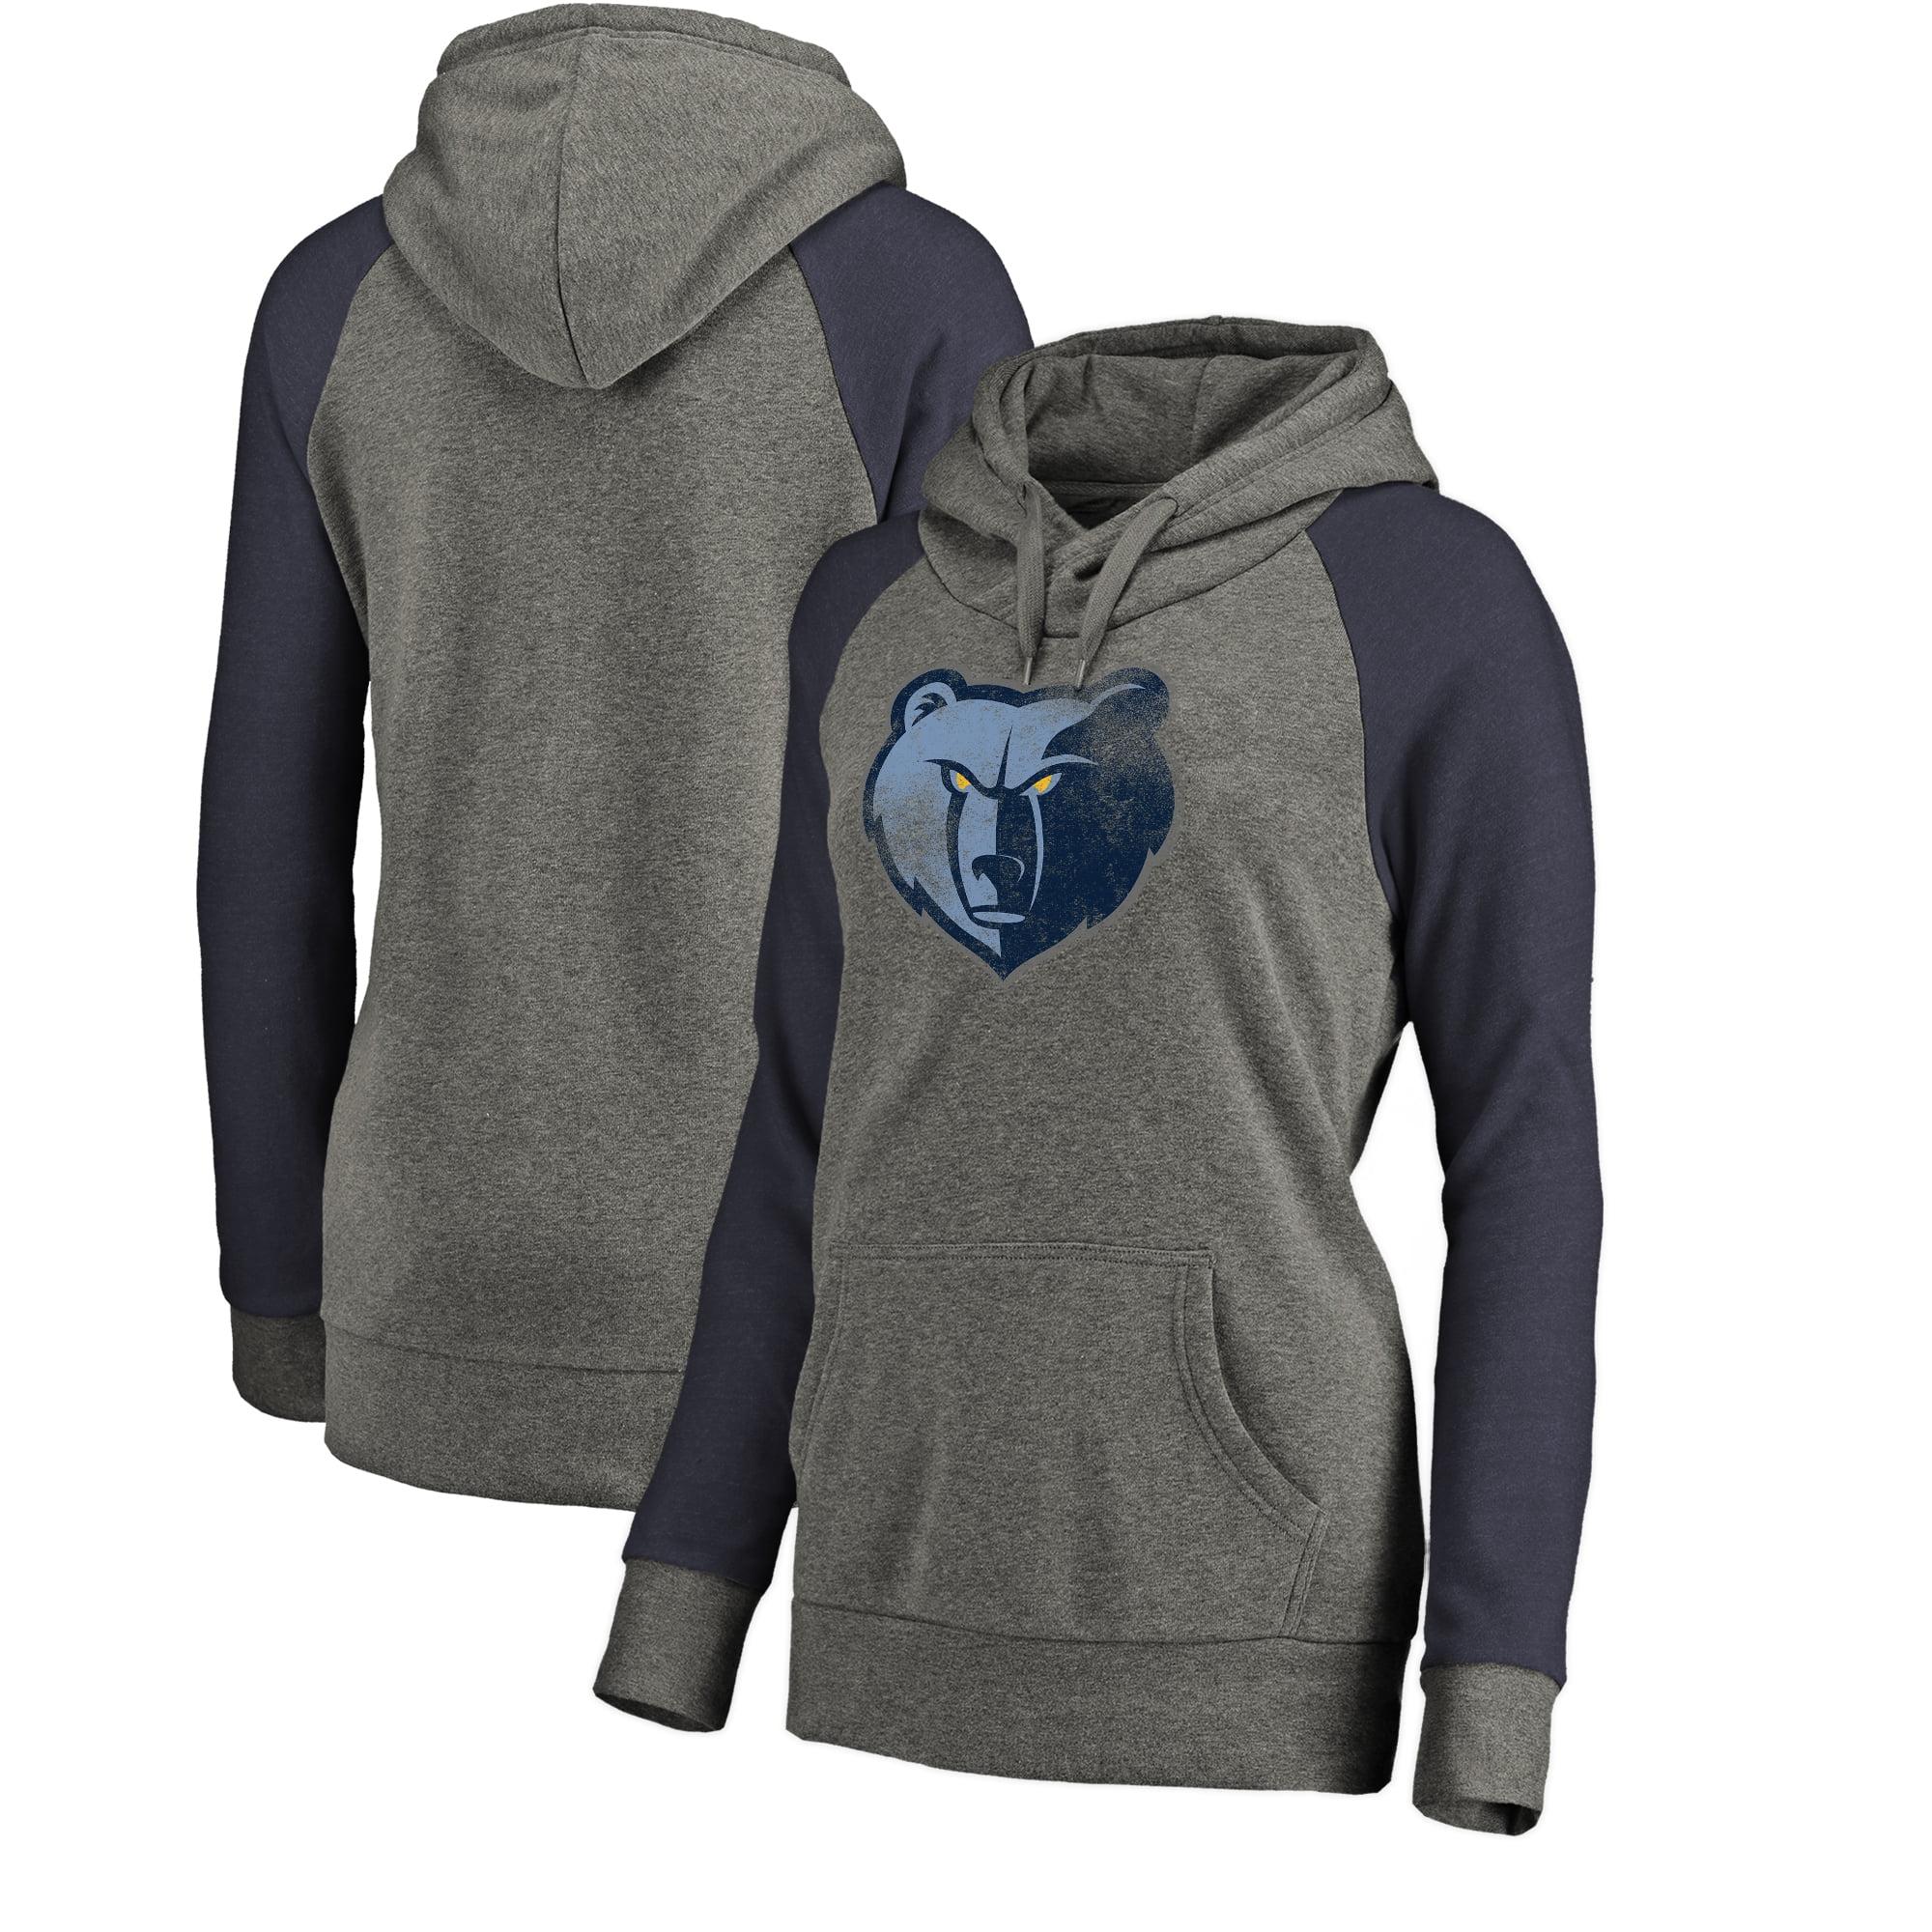 Memphis Grizzlies Fanatics Branded Women's Distressed Logo Tri-Blend Pullover Hoodie - Ash/Navy